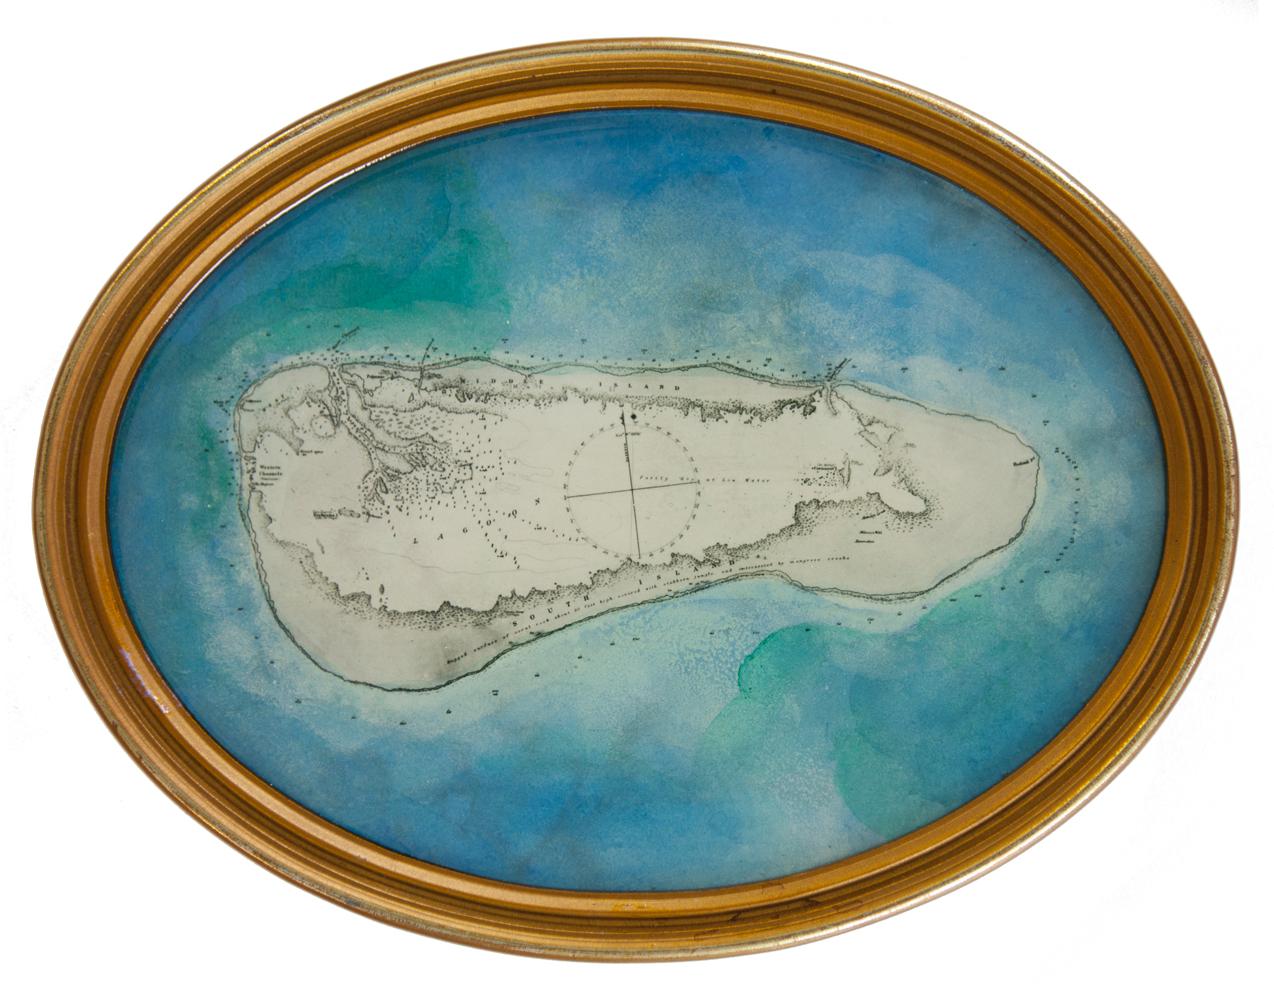 Shiraz Bayjoo    Aldabra No.2     (Ocean Miniatures series)  Acrylic, resin, wood  22.5 x 17 x 2 cm  2016